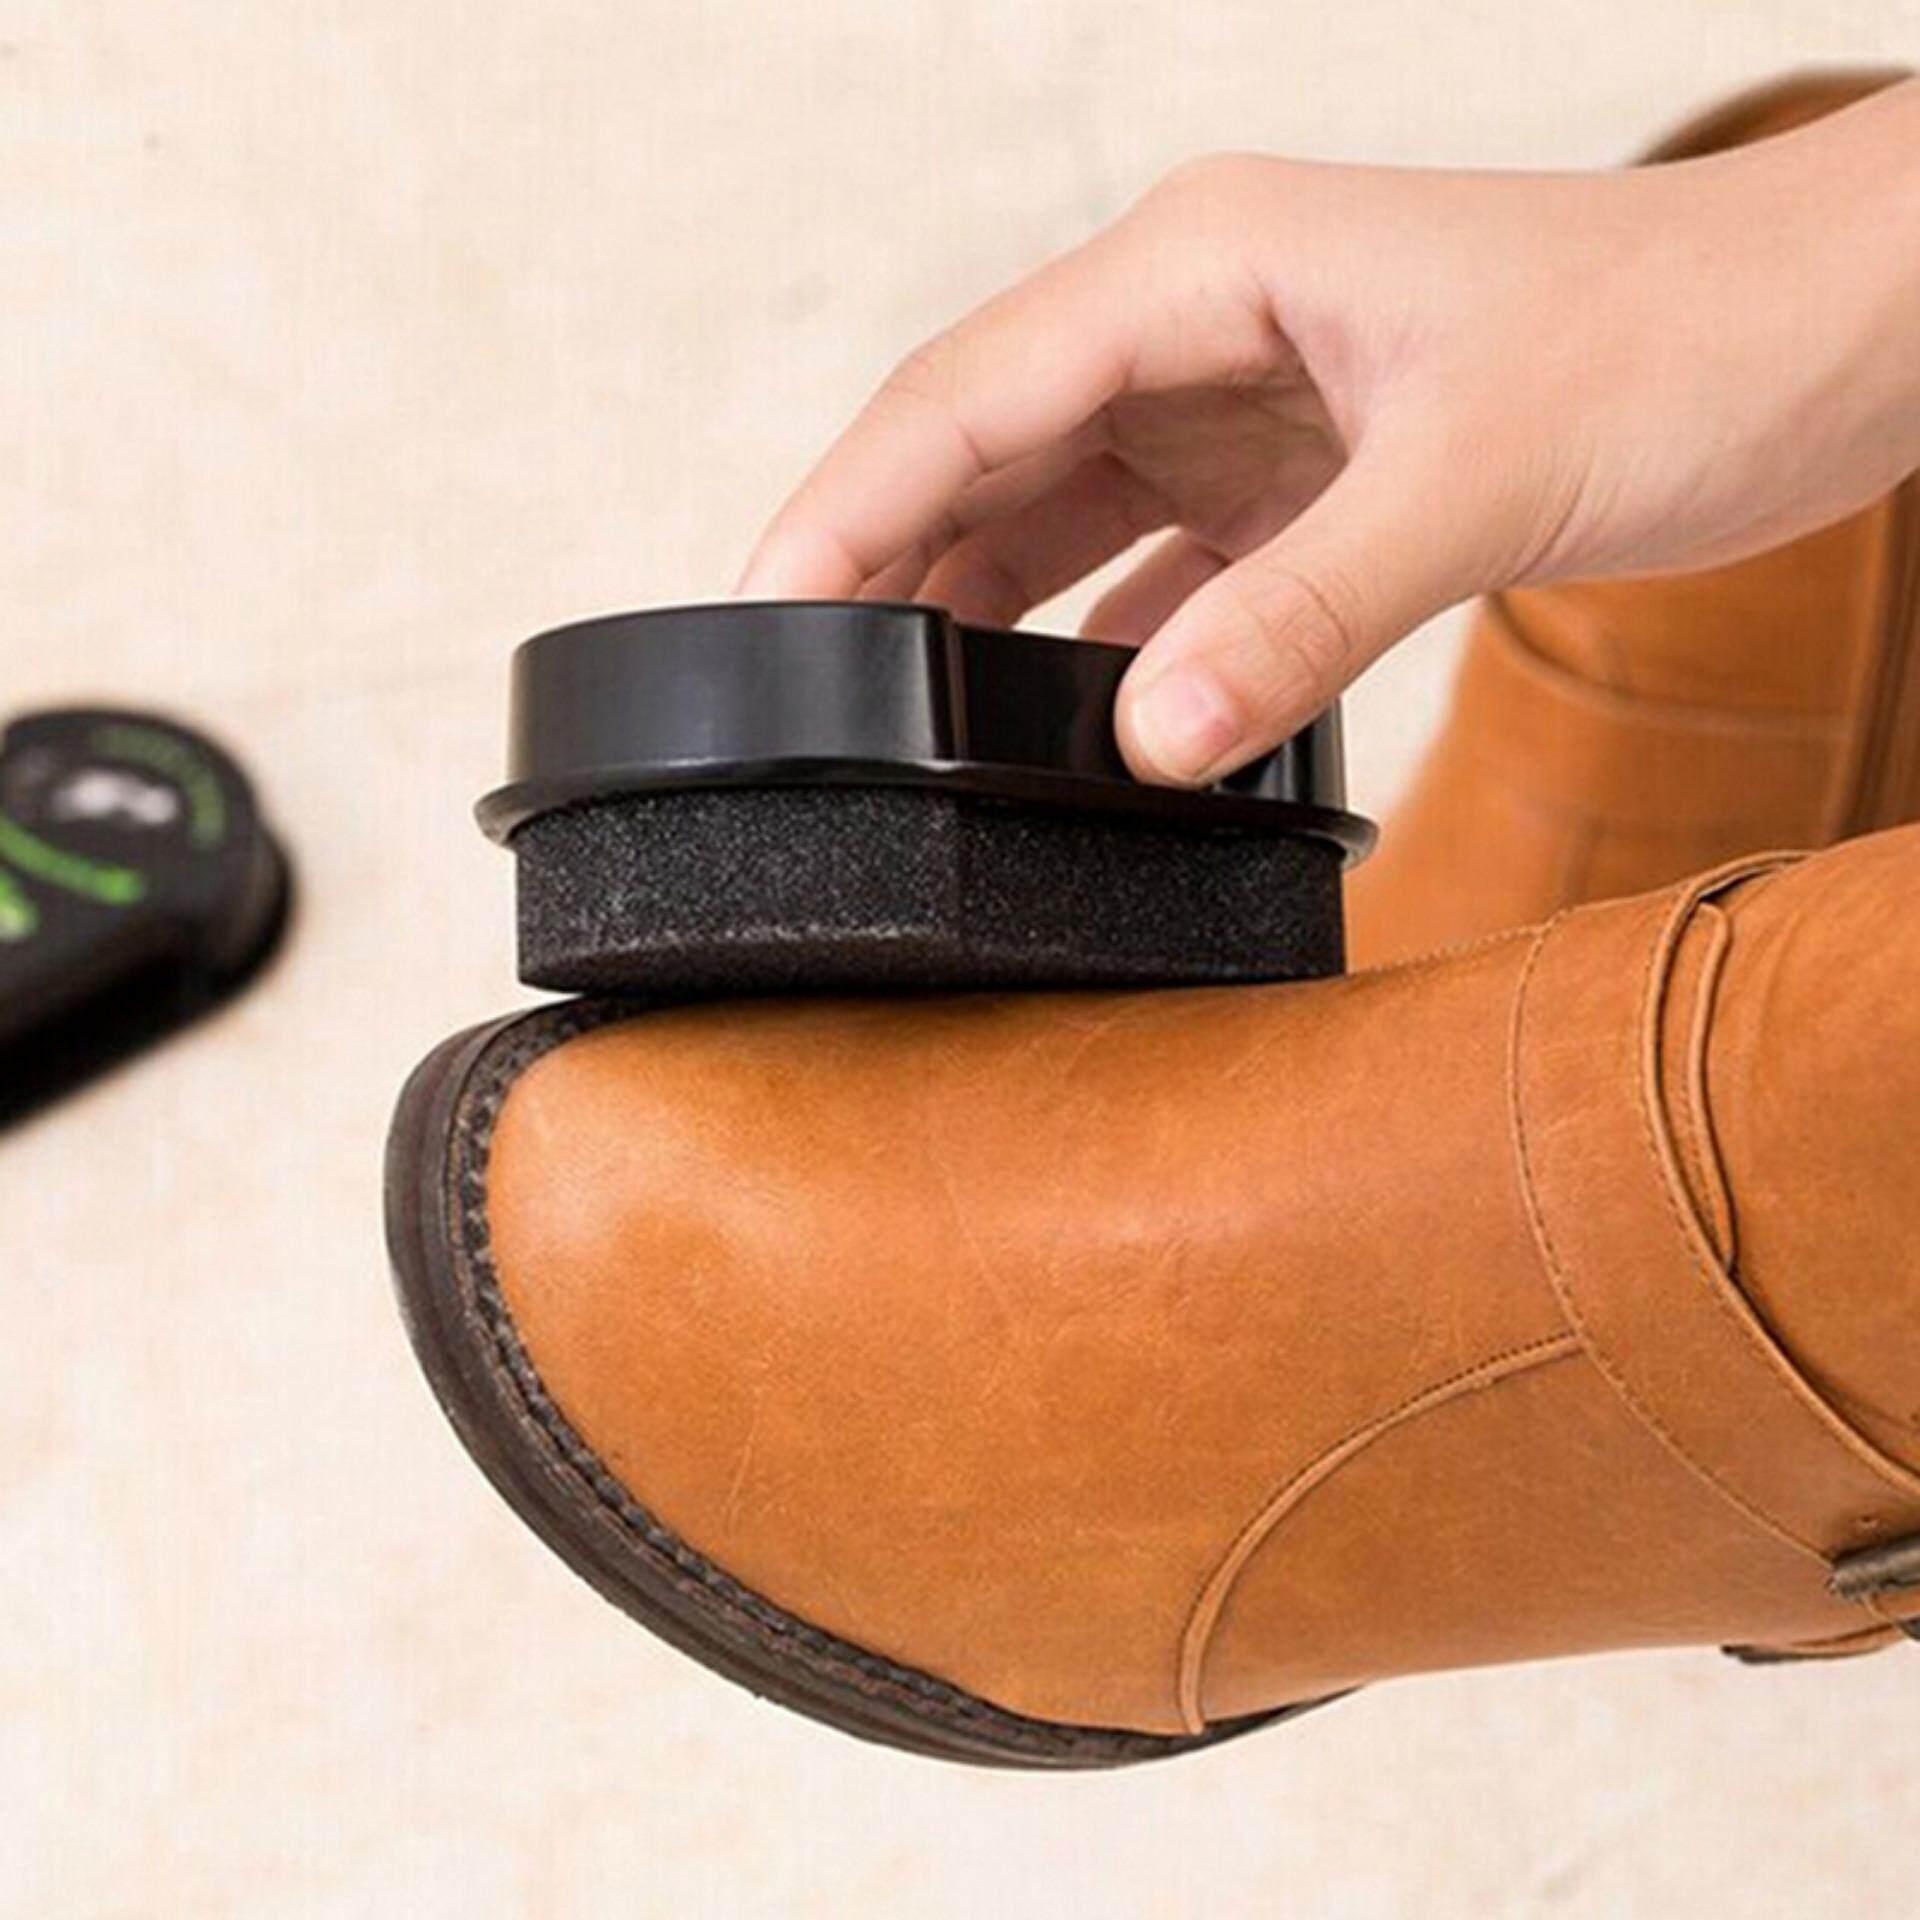 Quick Shine Shoes Shine Sponge Brush Polish Dust Cleaner Cleaning Tool - intl